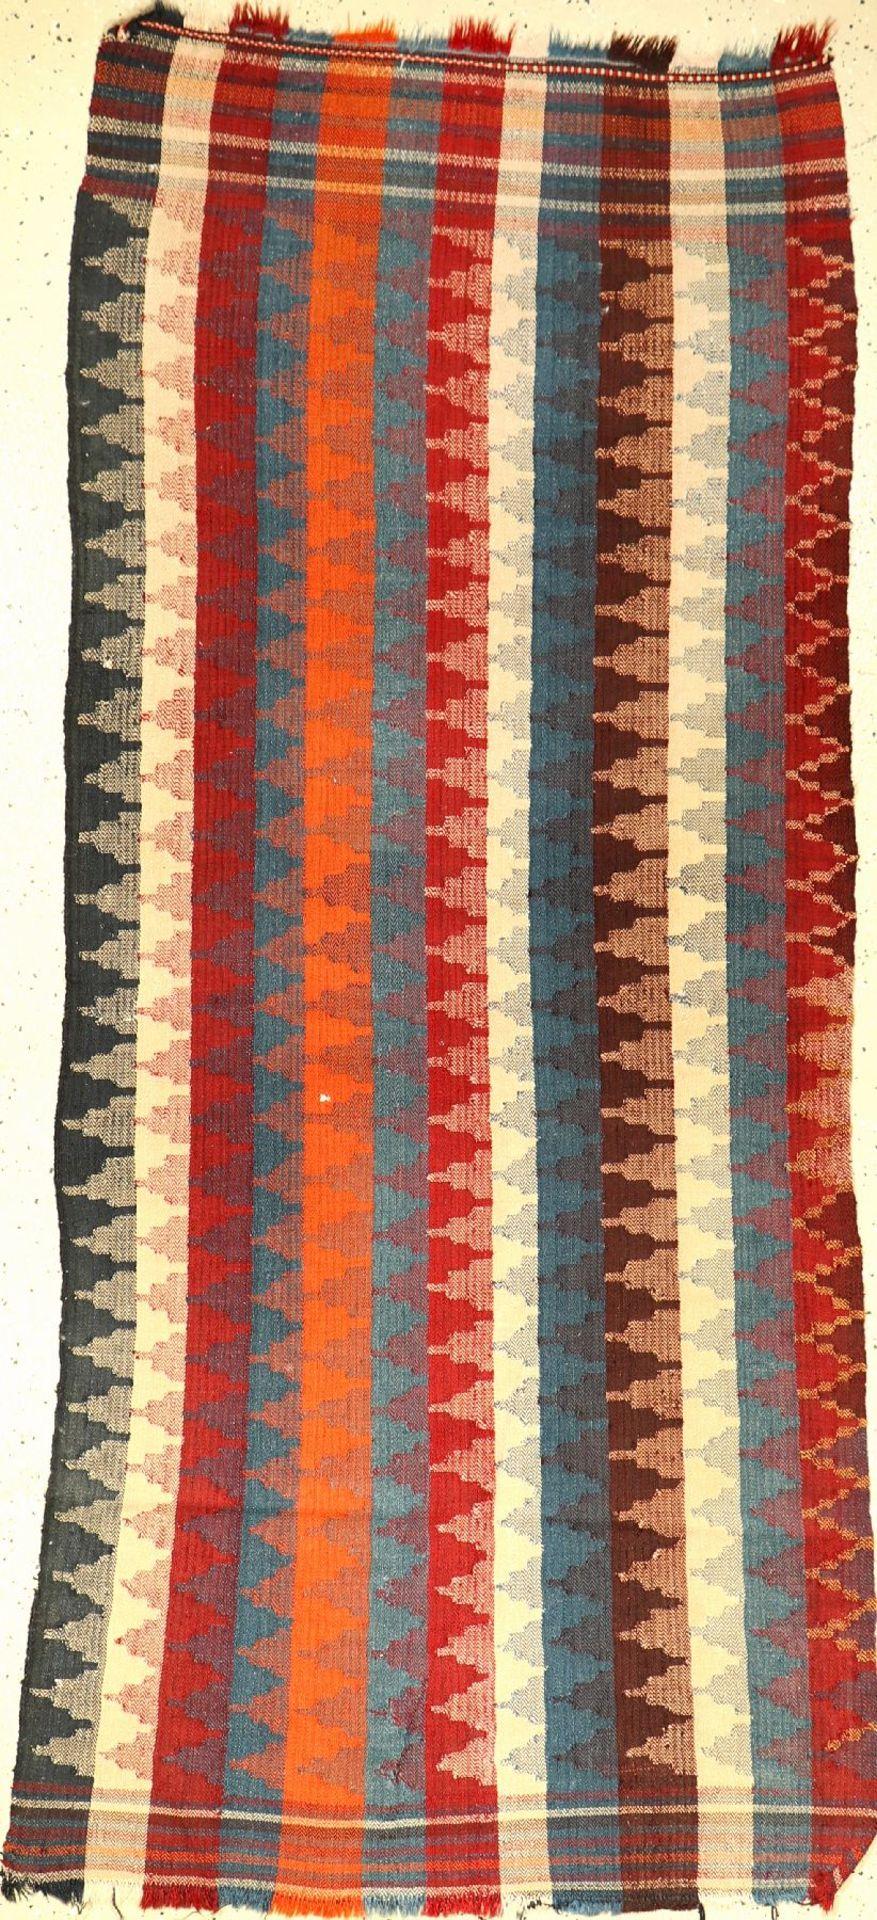 Gashgai-Moj Kelim alt, Persien, um 1940, Wolle auf Wolle, ca. 202 x 94 cm, EHZ: 2-3Gashgai-Moj Kilim